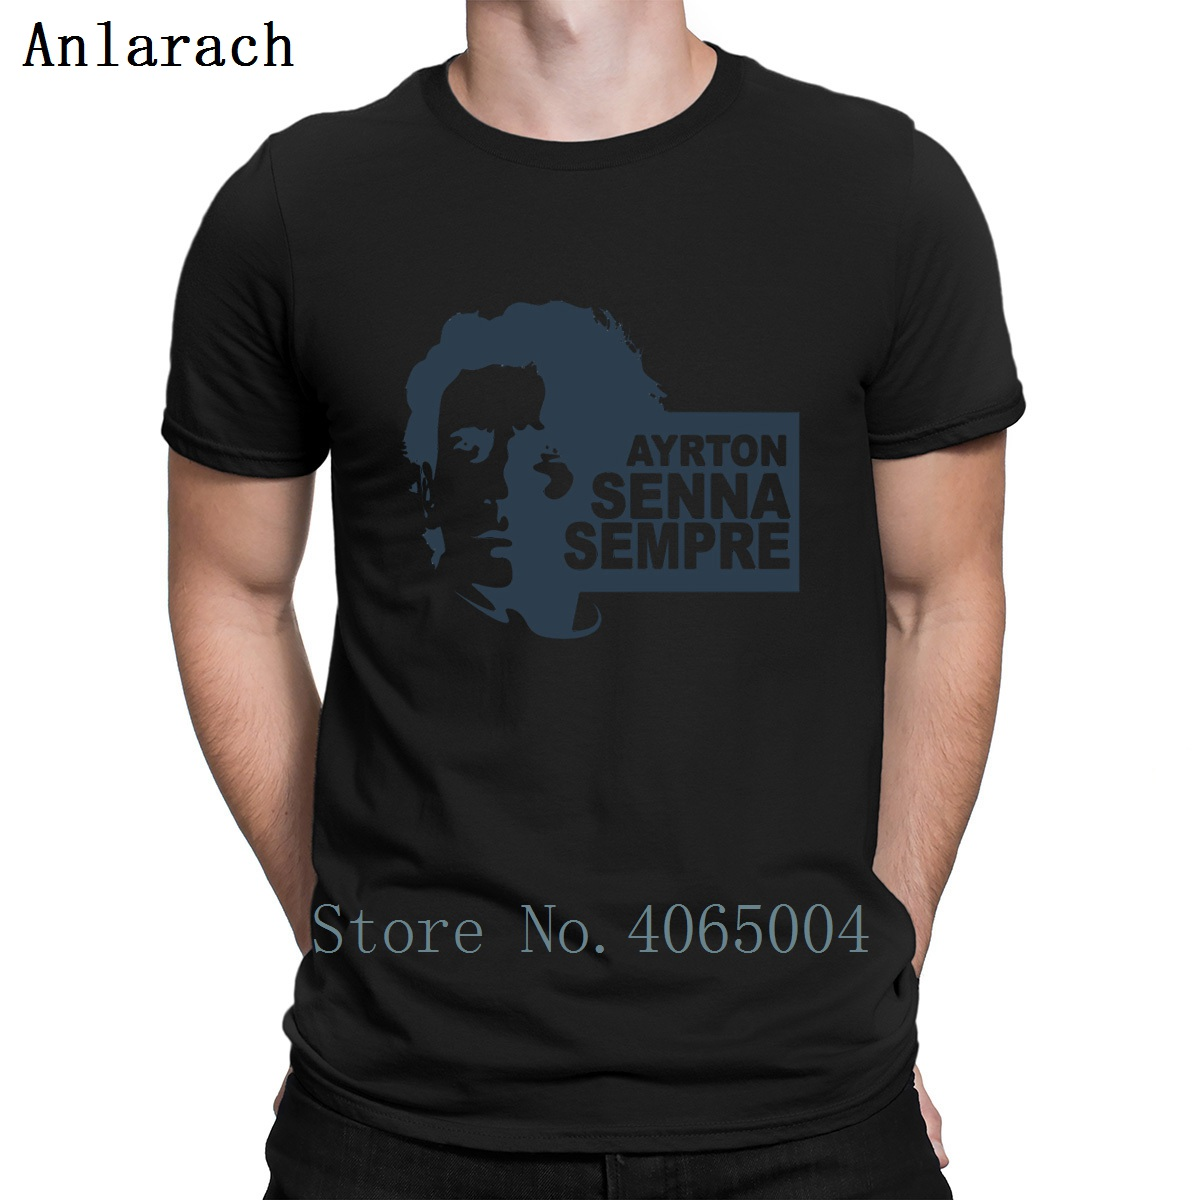 ayrton-font-b-senna-b-font-sempre-t-shirt-letter-crazy-breathable-cotton-pattern-summer-style-euro-size-s-3xl-character-shirt